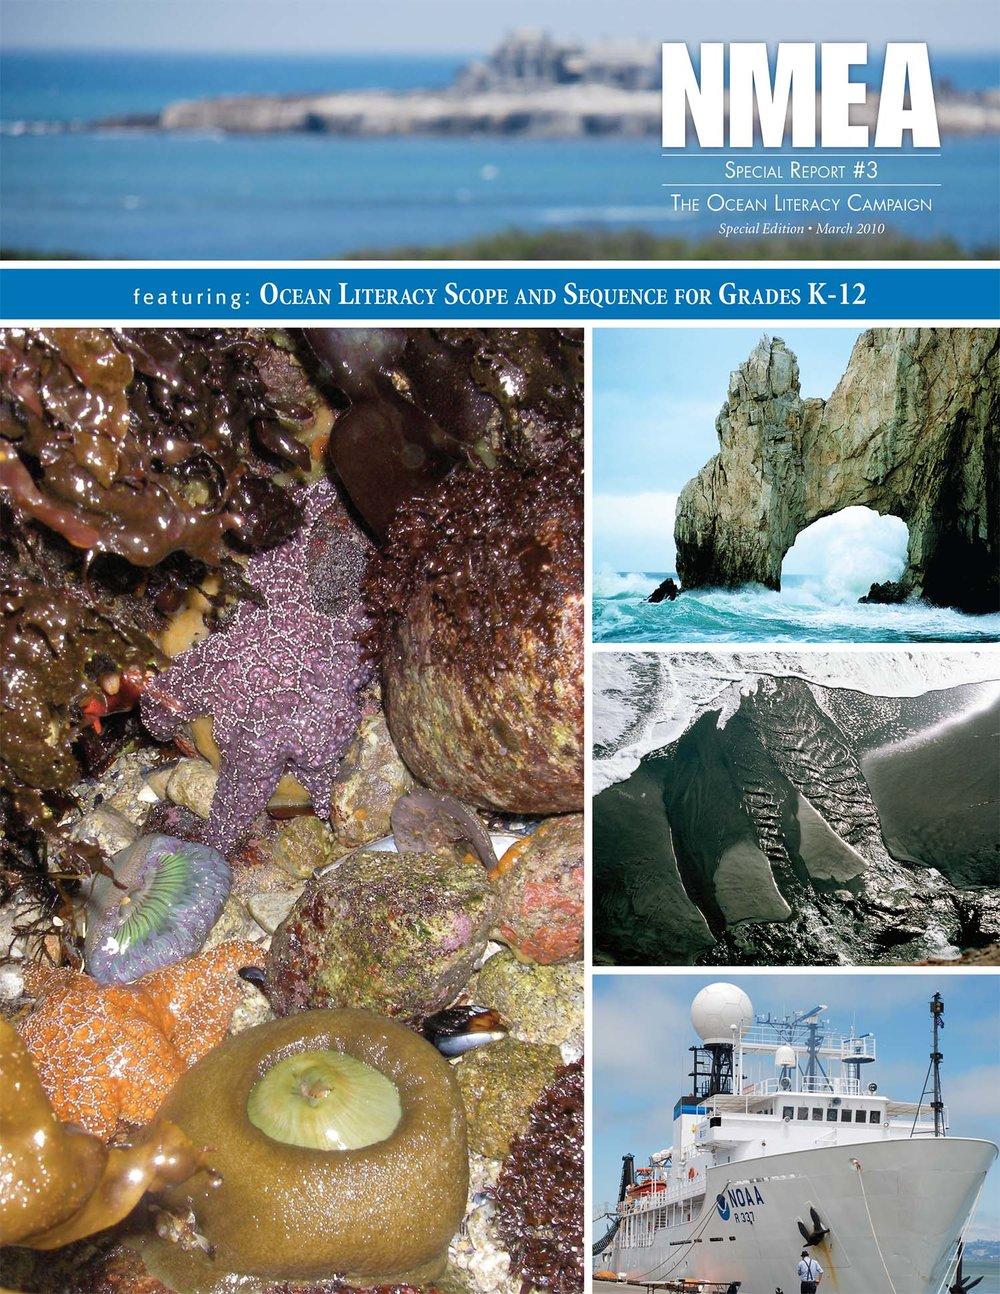 NMEA_OL-special-report-cover.jpg